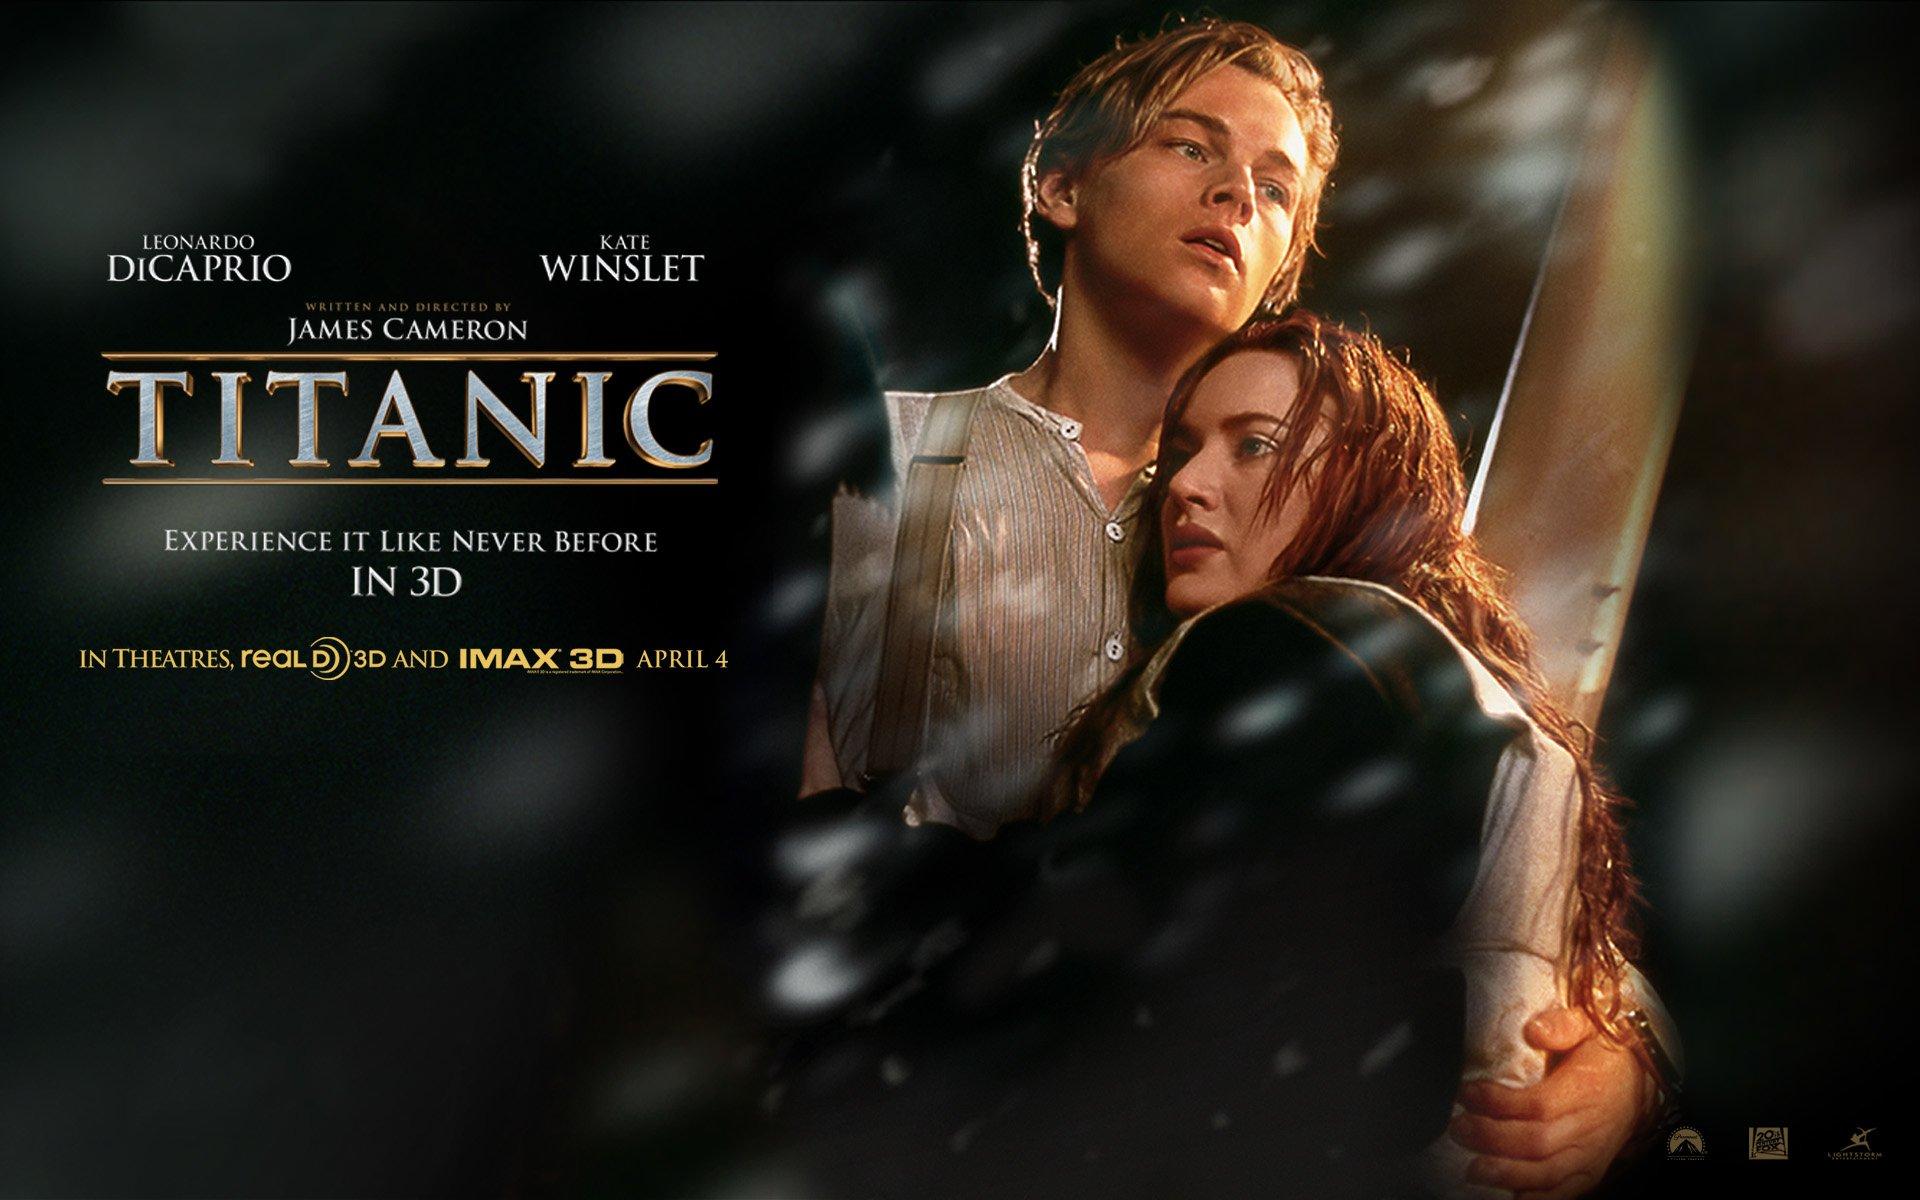 Titanic trailer download